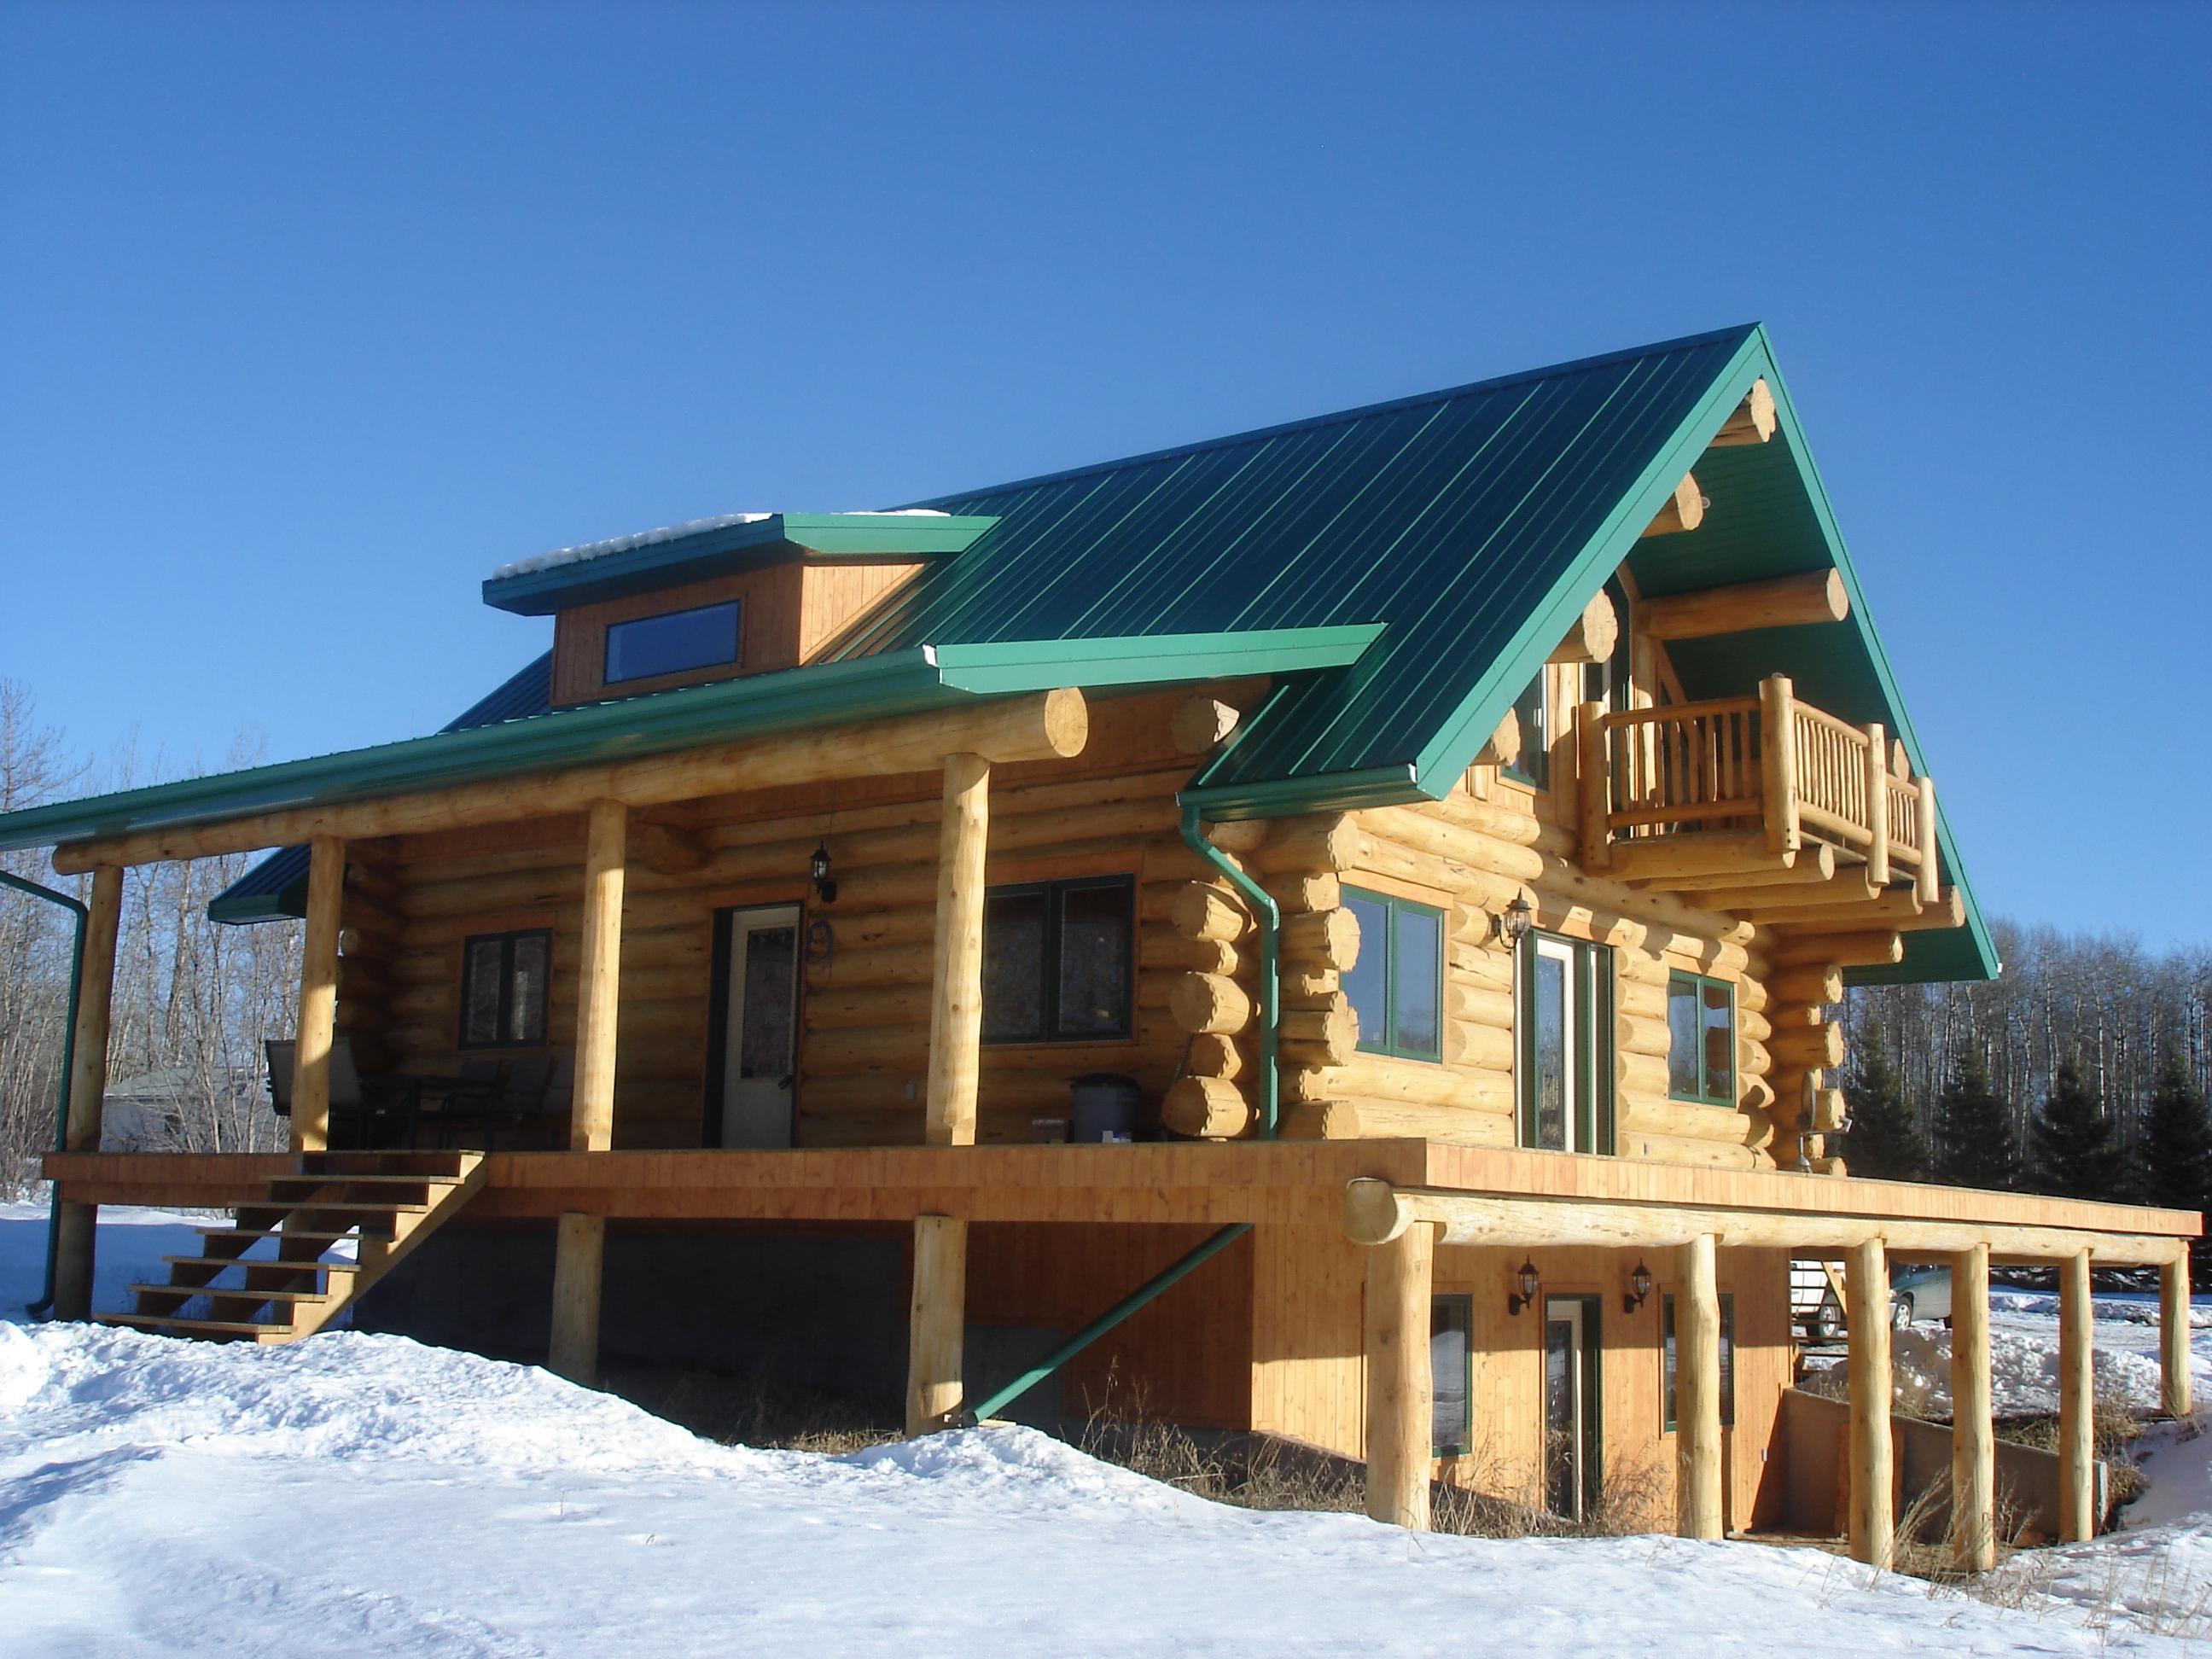 Shielha & Dominiques House-Winter 2008 135